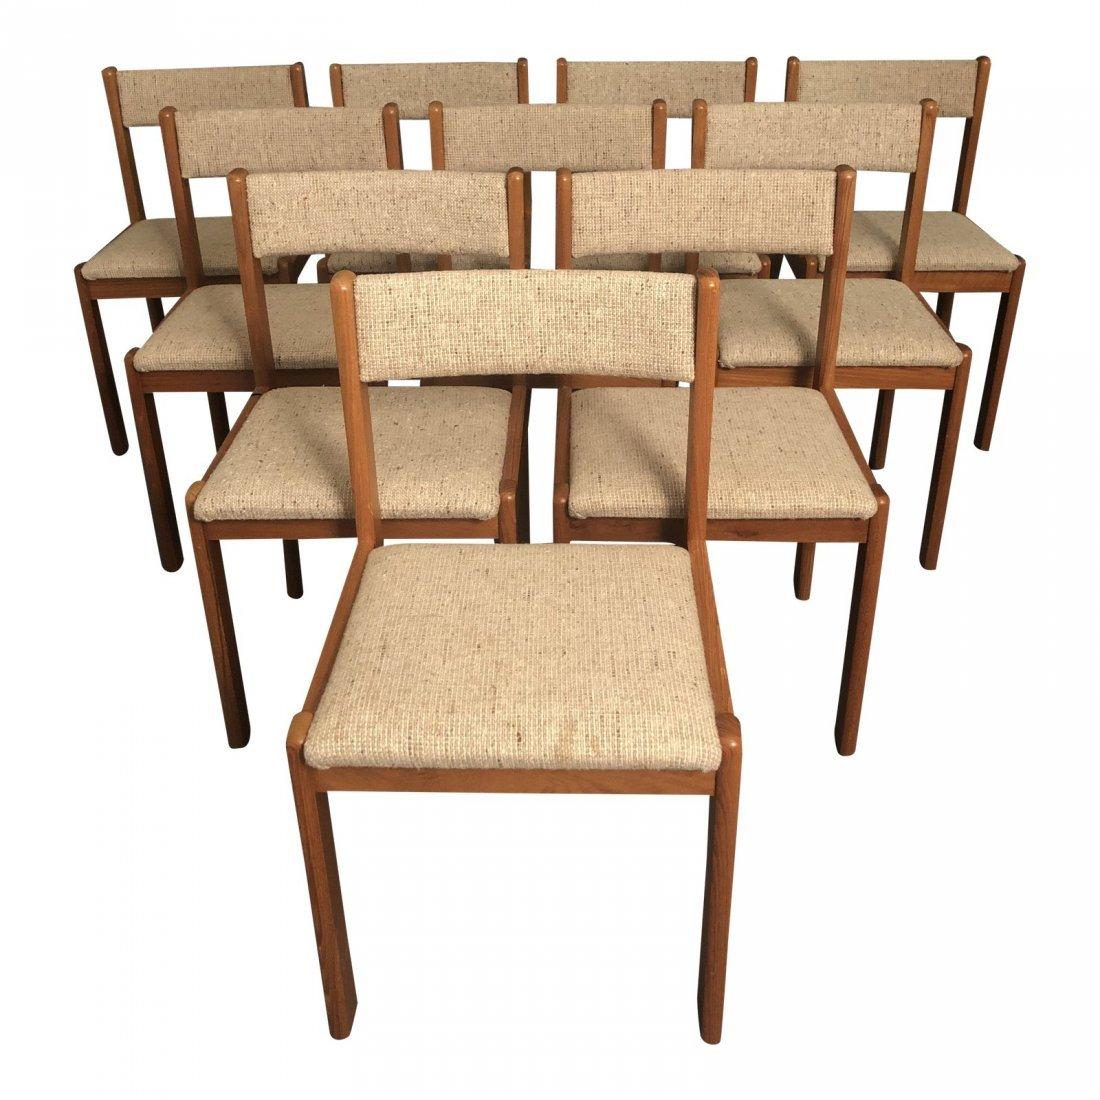 Vintage Mid-Century Teak Danish Dining Chairs- Set of 1